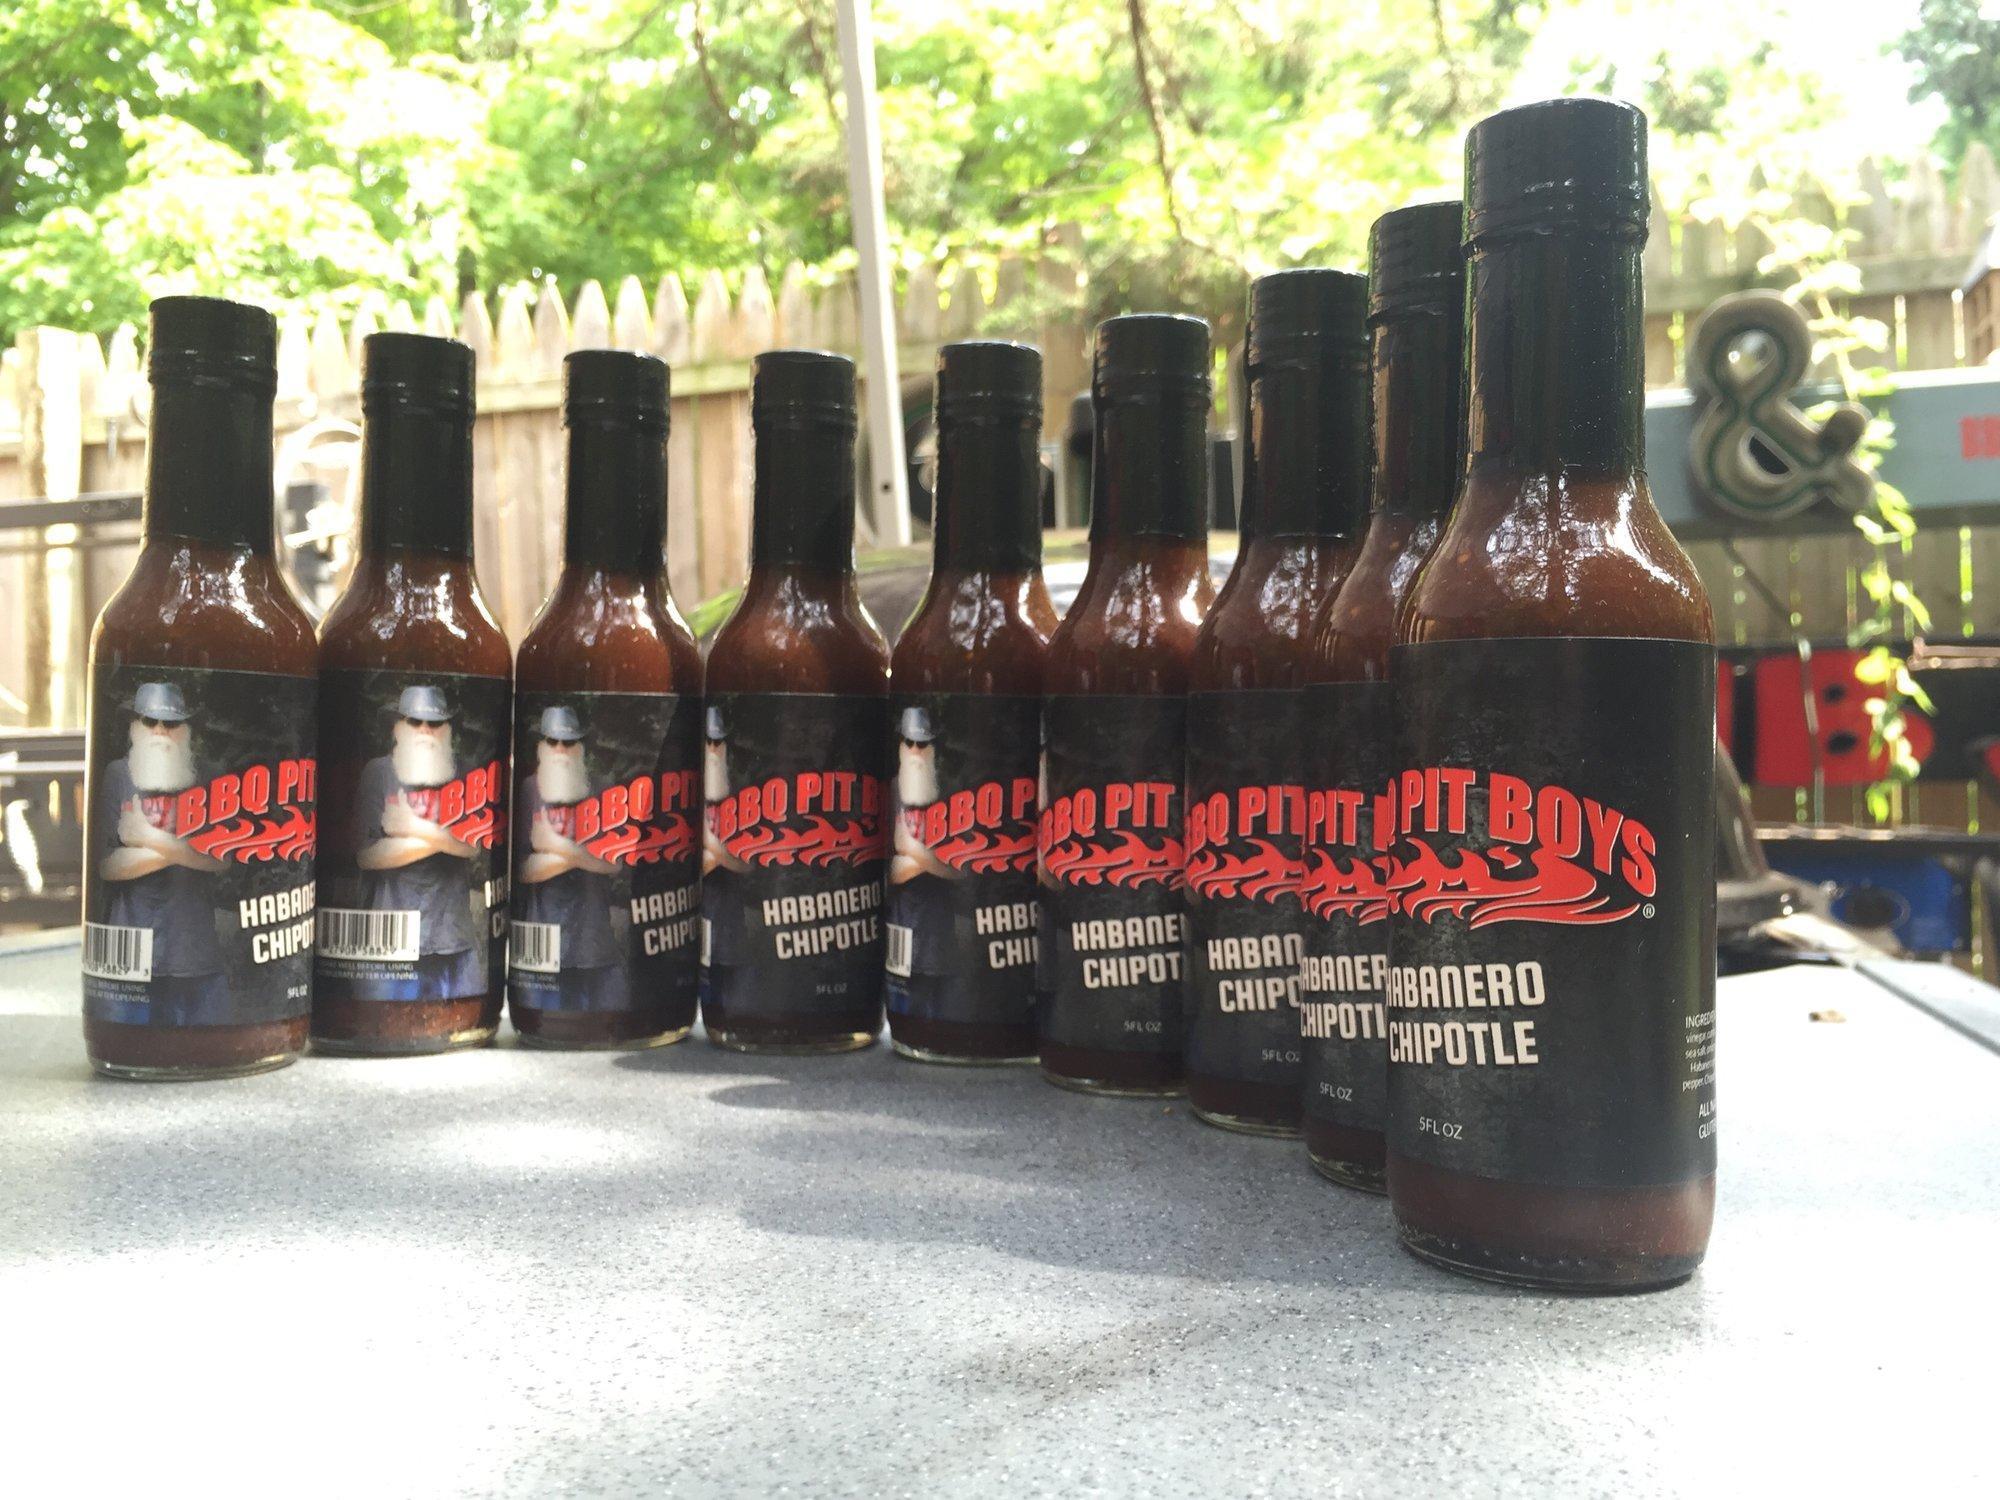 BBQ Pit Boys Hot Sauce